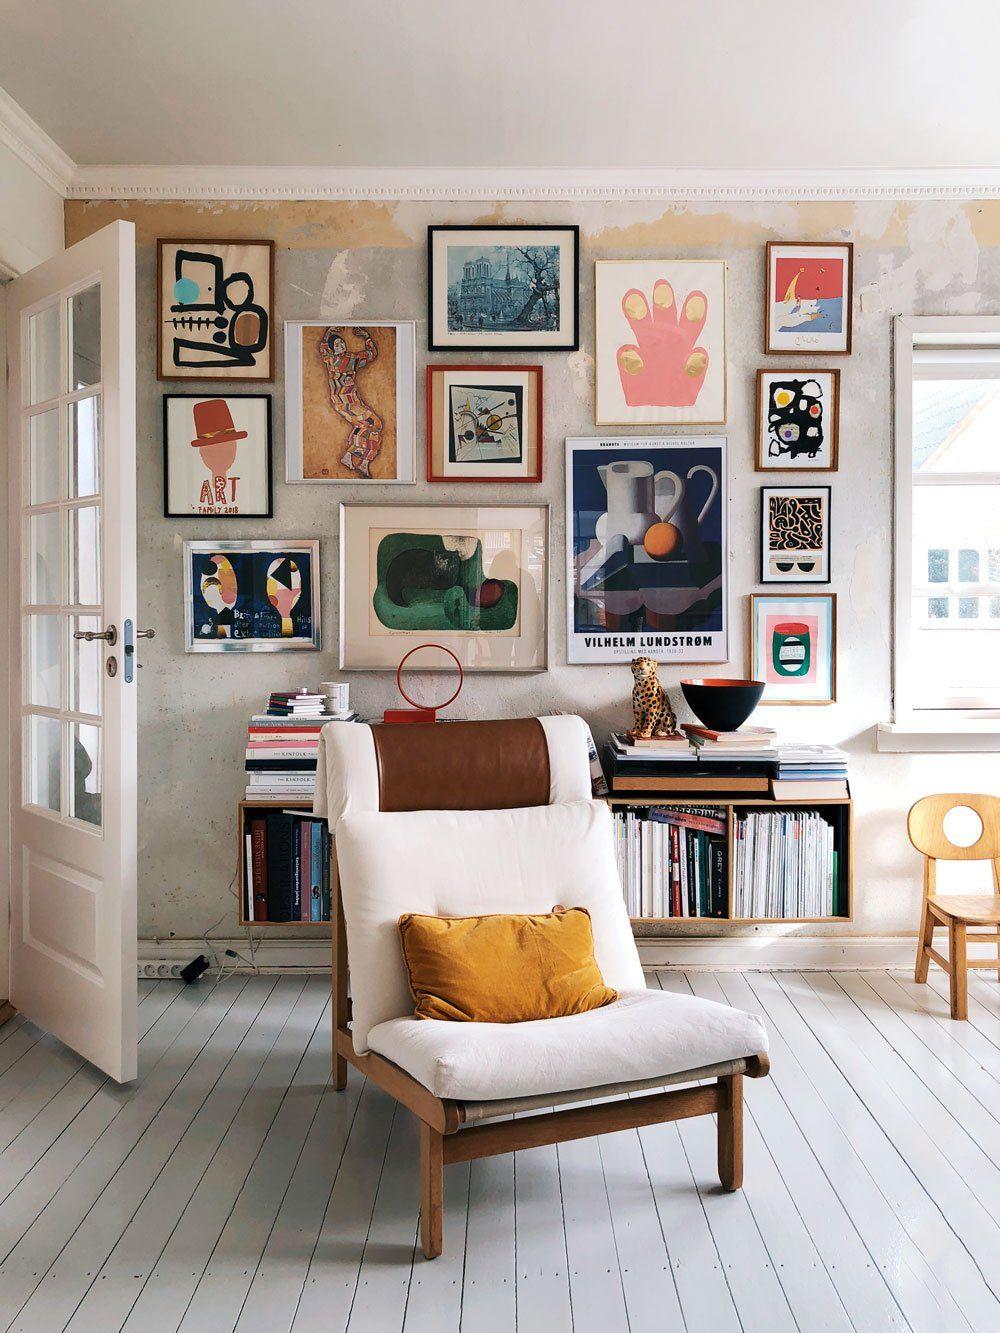 Impressive Home Art Gallery Sfgirlbybay Easy Home Decor Home